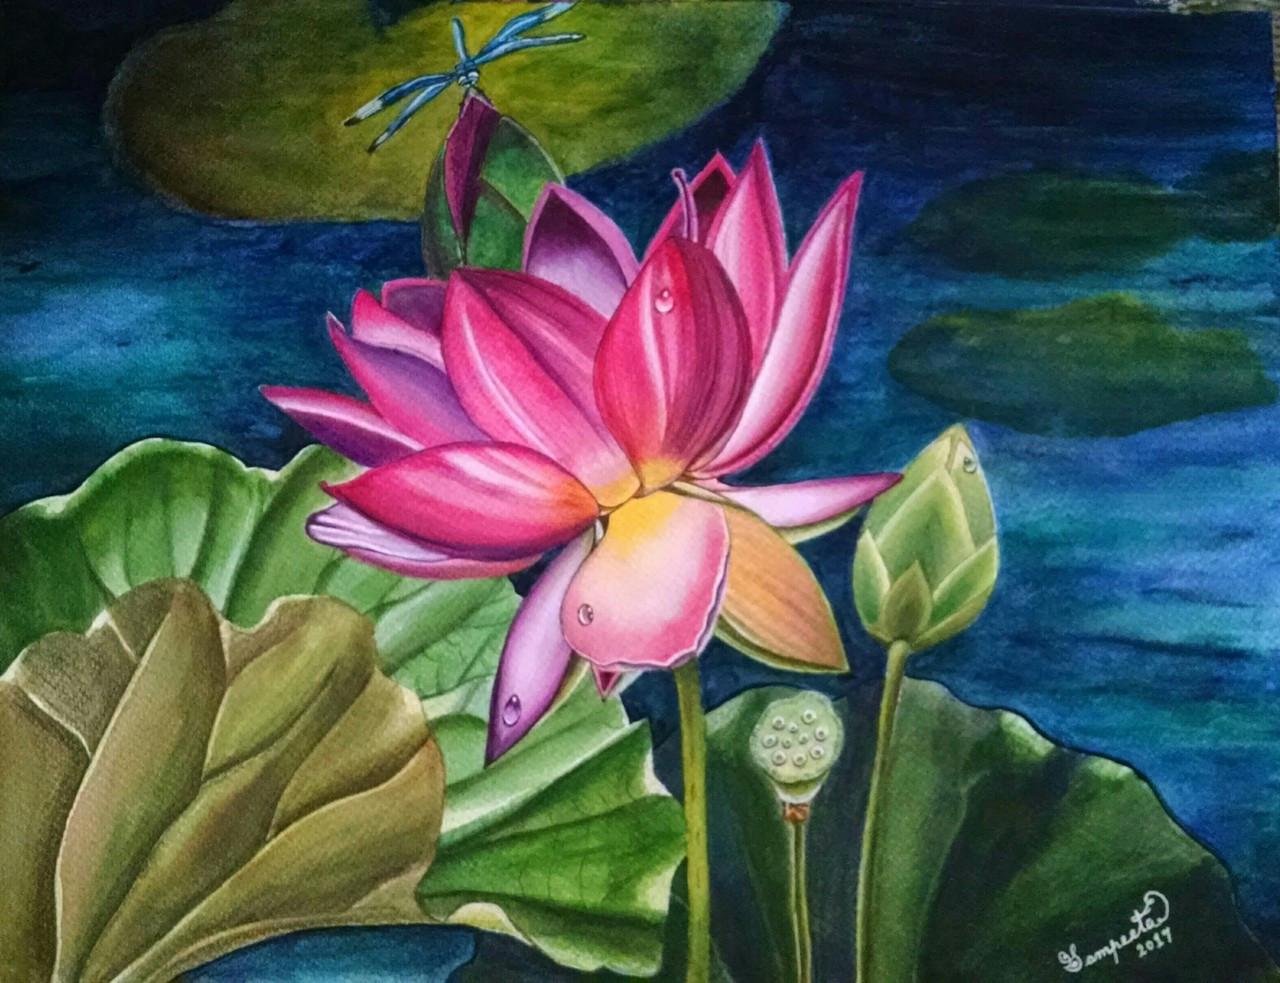 Buy My Spirit Handmade Painting By Sampeeta Banerjee Code